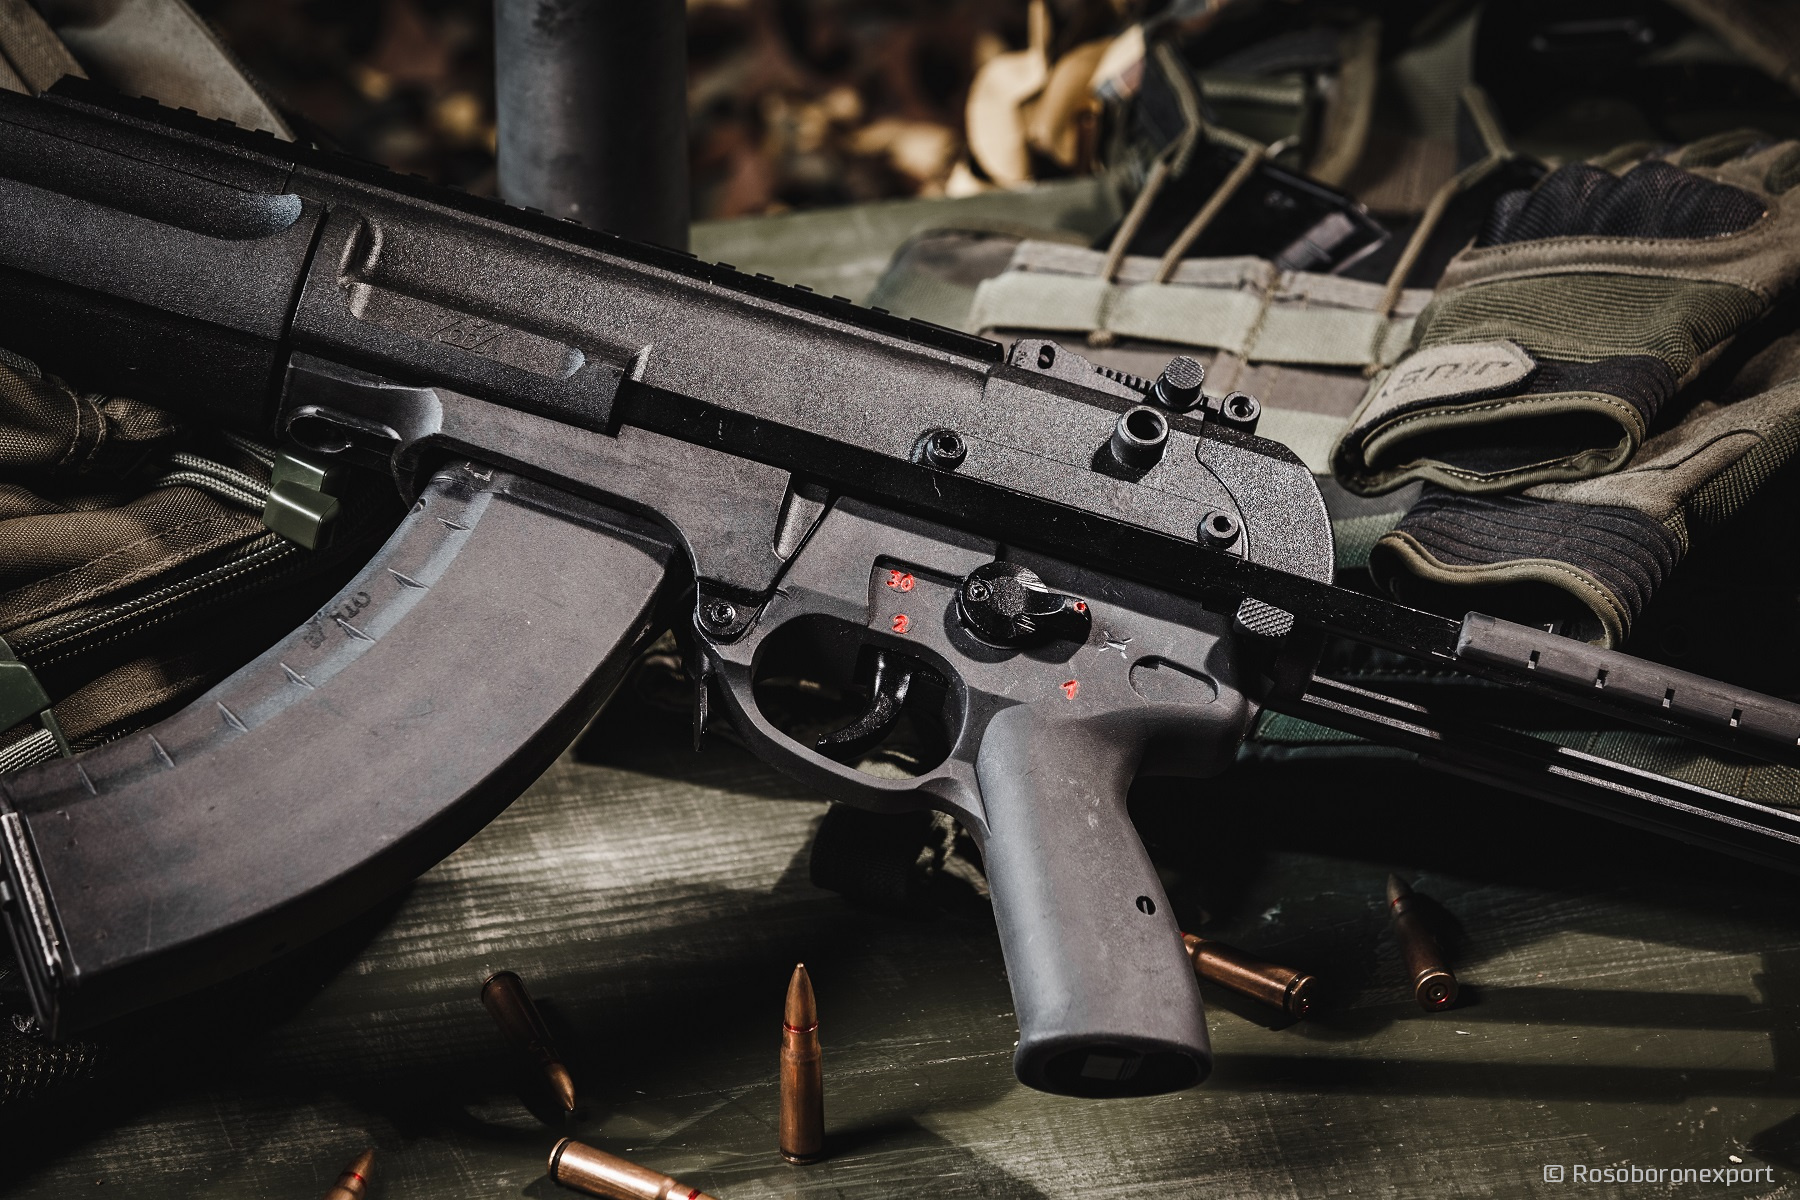 Russian Assault Rifles/Carbines/Machine Guns Thread: #2 - Page 10 Ed7e9ea654c21f19adb52e69e7b0005a